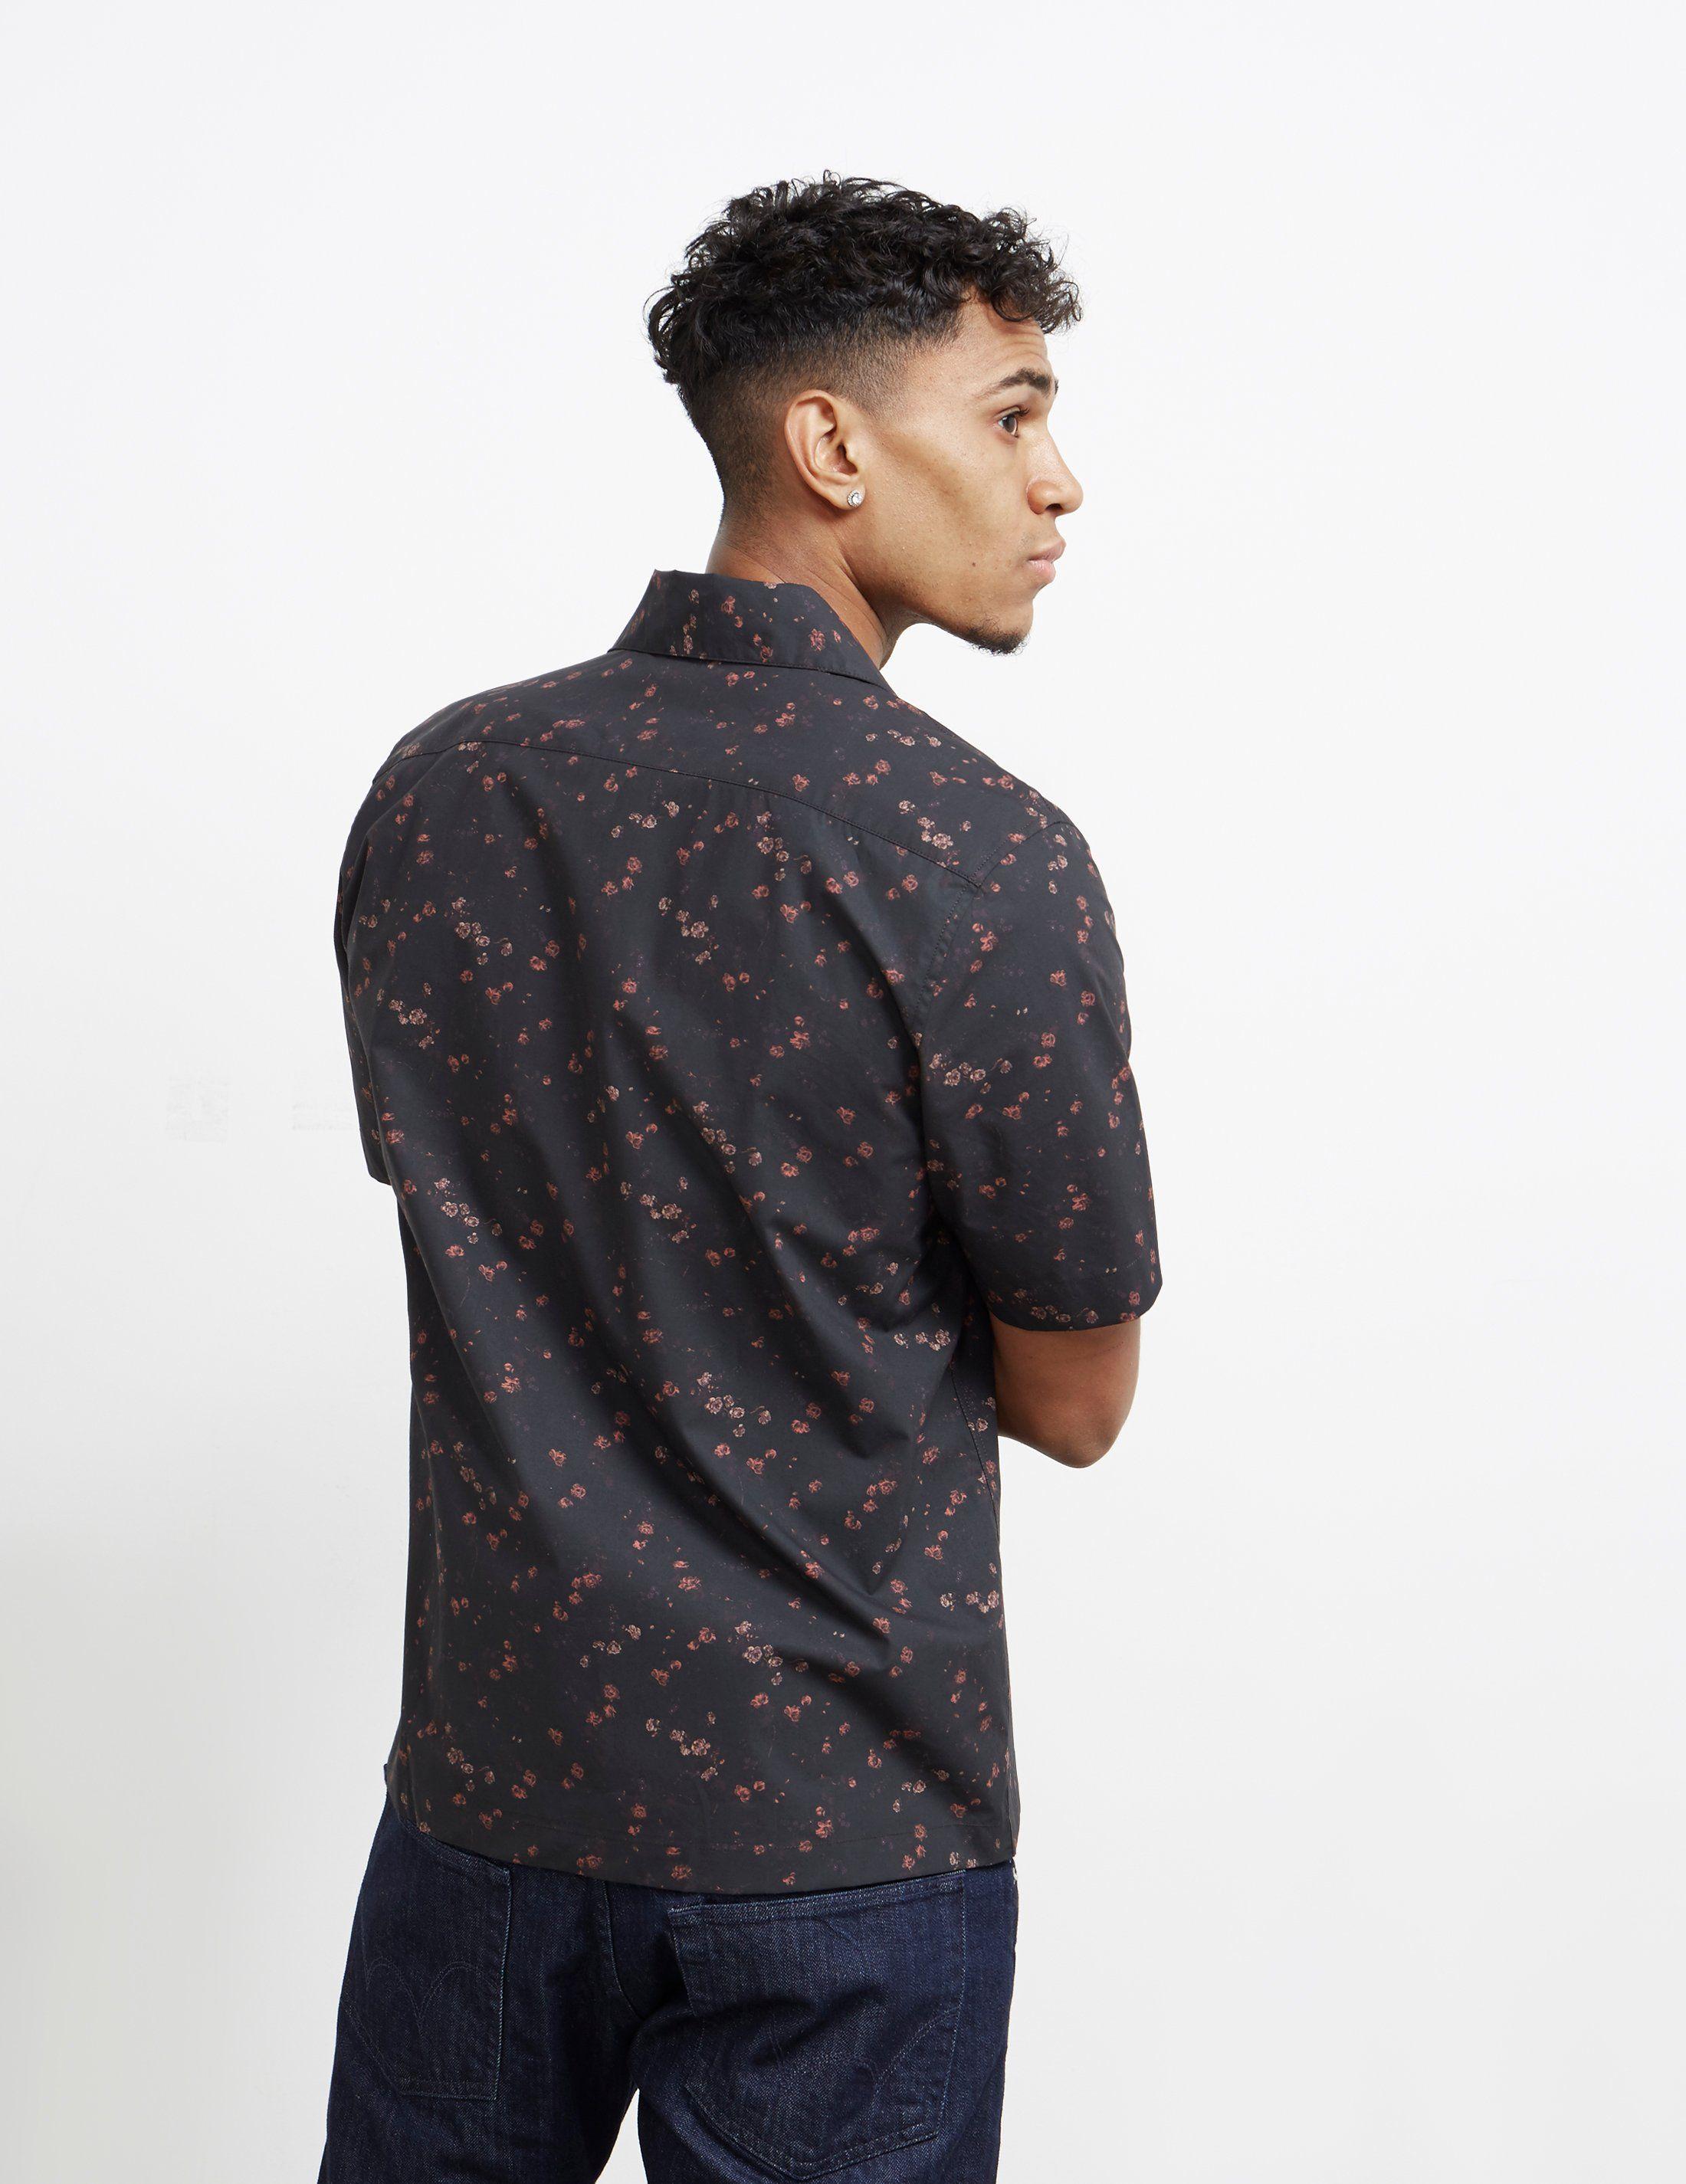 Fred Perry x Miles Kane Short Sleeve Liberty Print Shirt